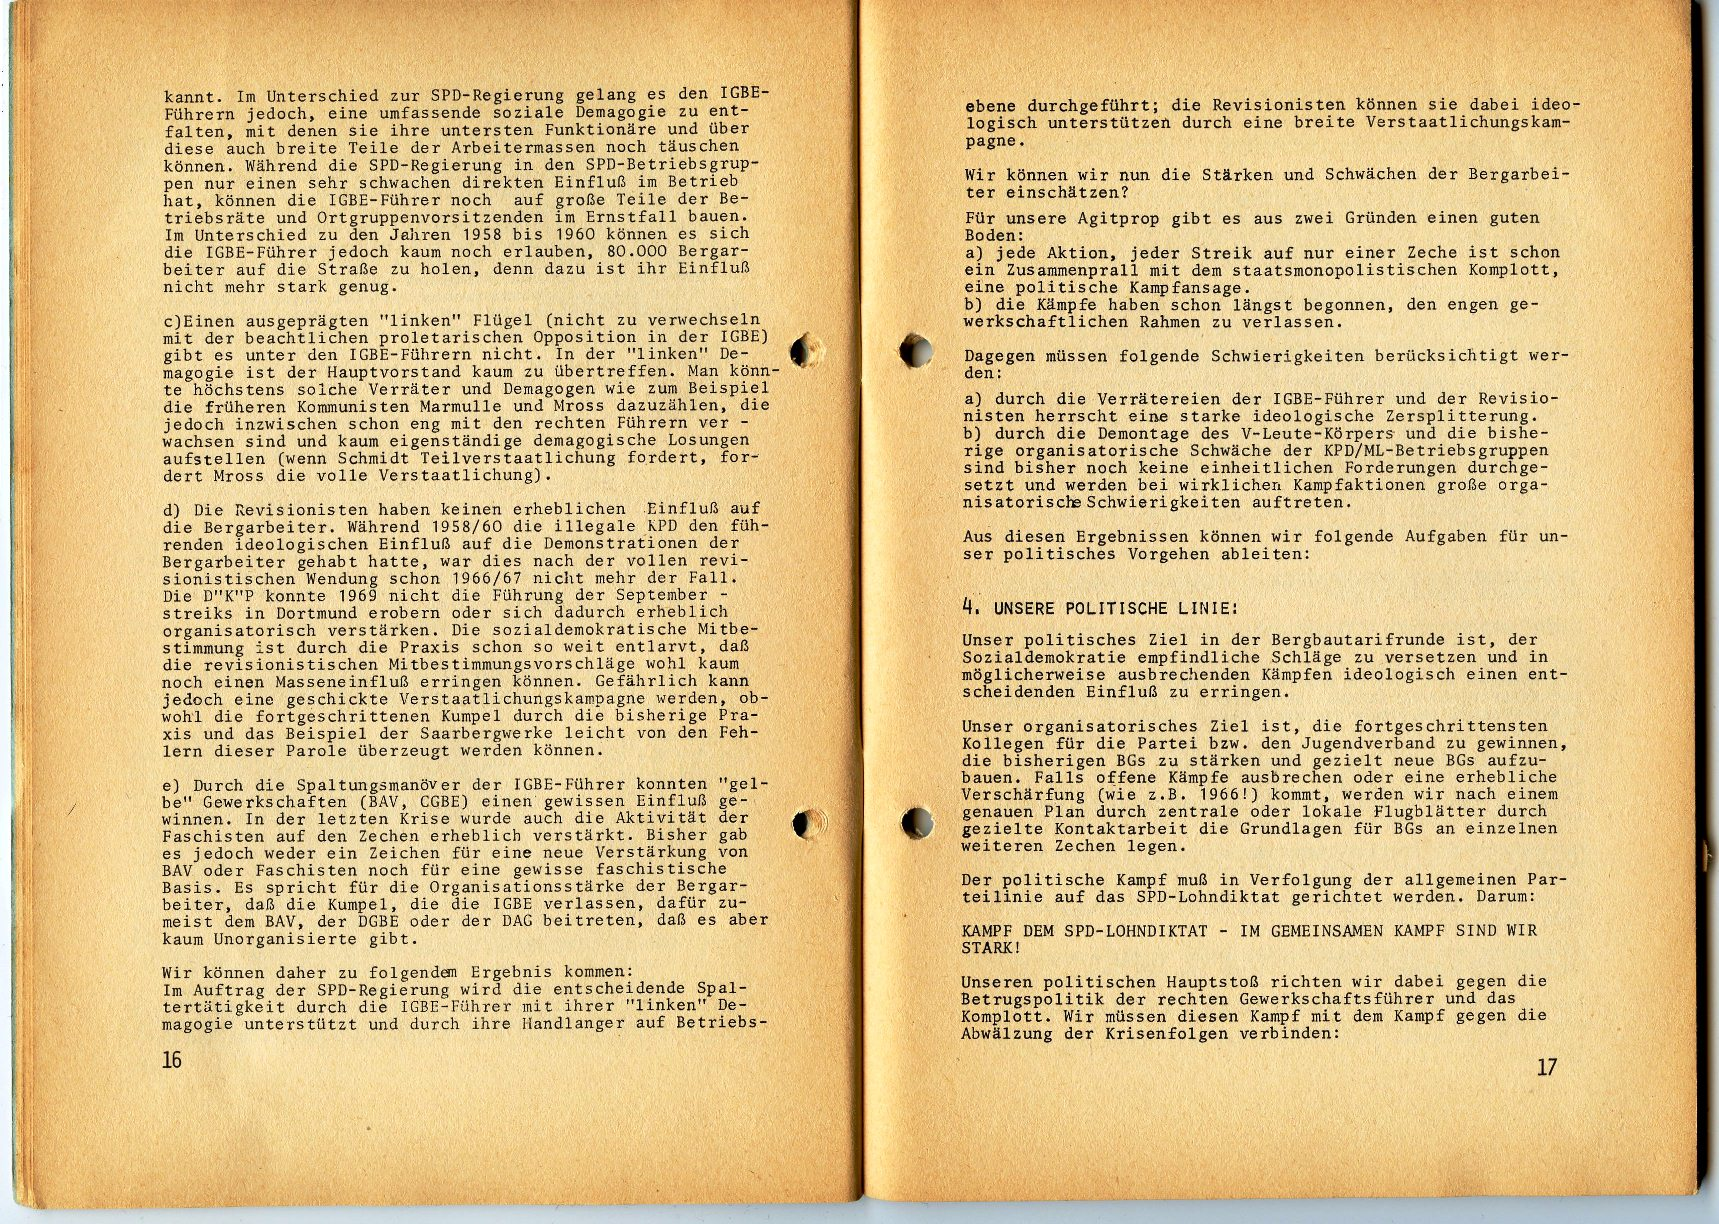 ZB_Parteiarbeiter_1971_04_09